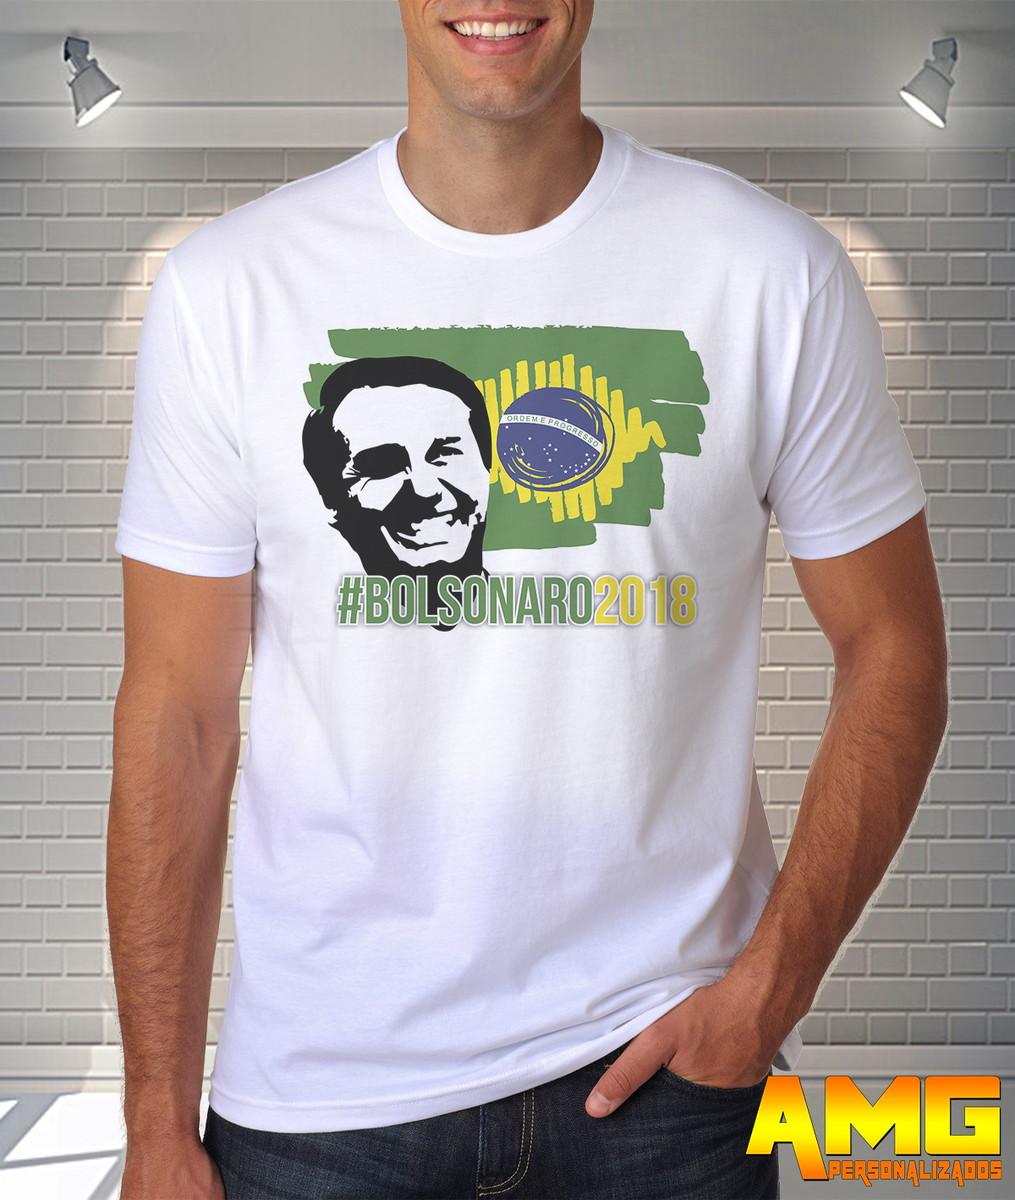 02a71ca232 Camisa Camiseta Jair Bolsonaro Presidente 2018 Mito Ref08 no Elo7 ...